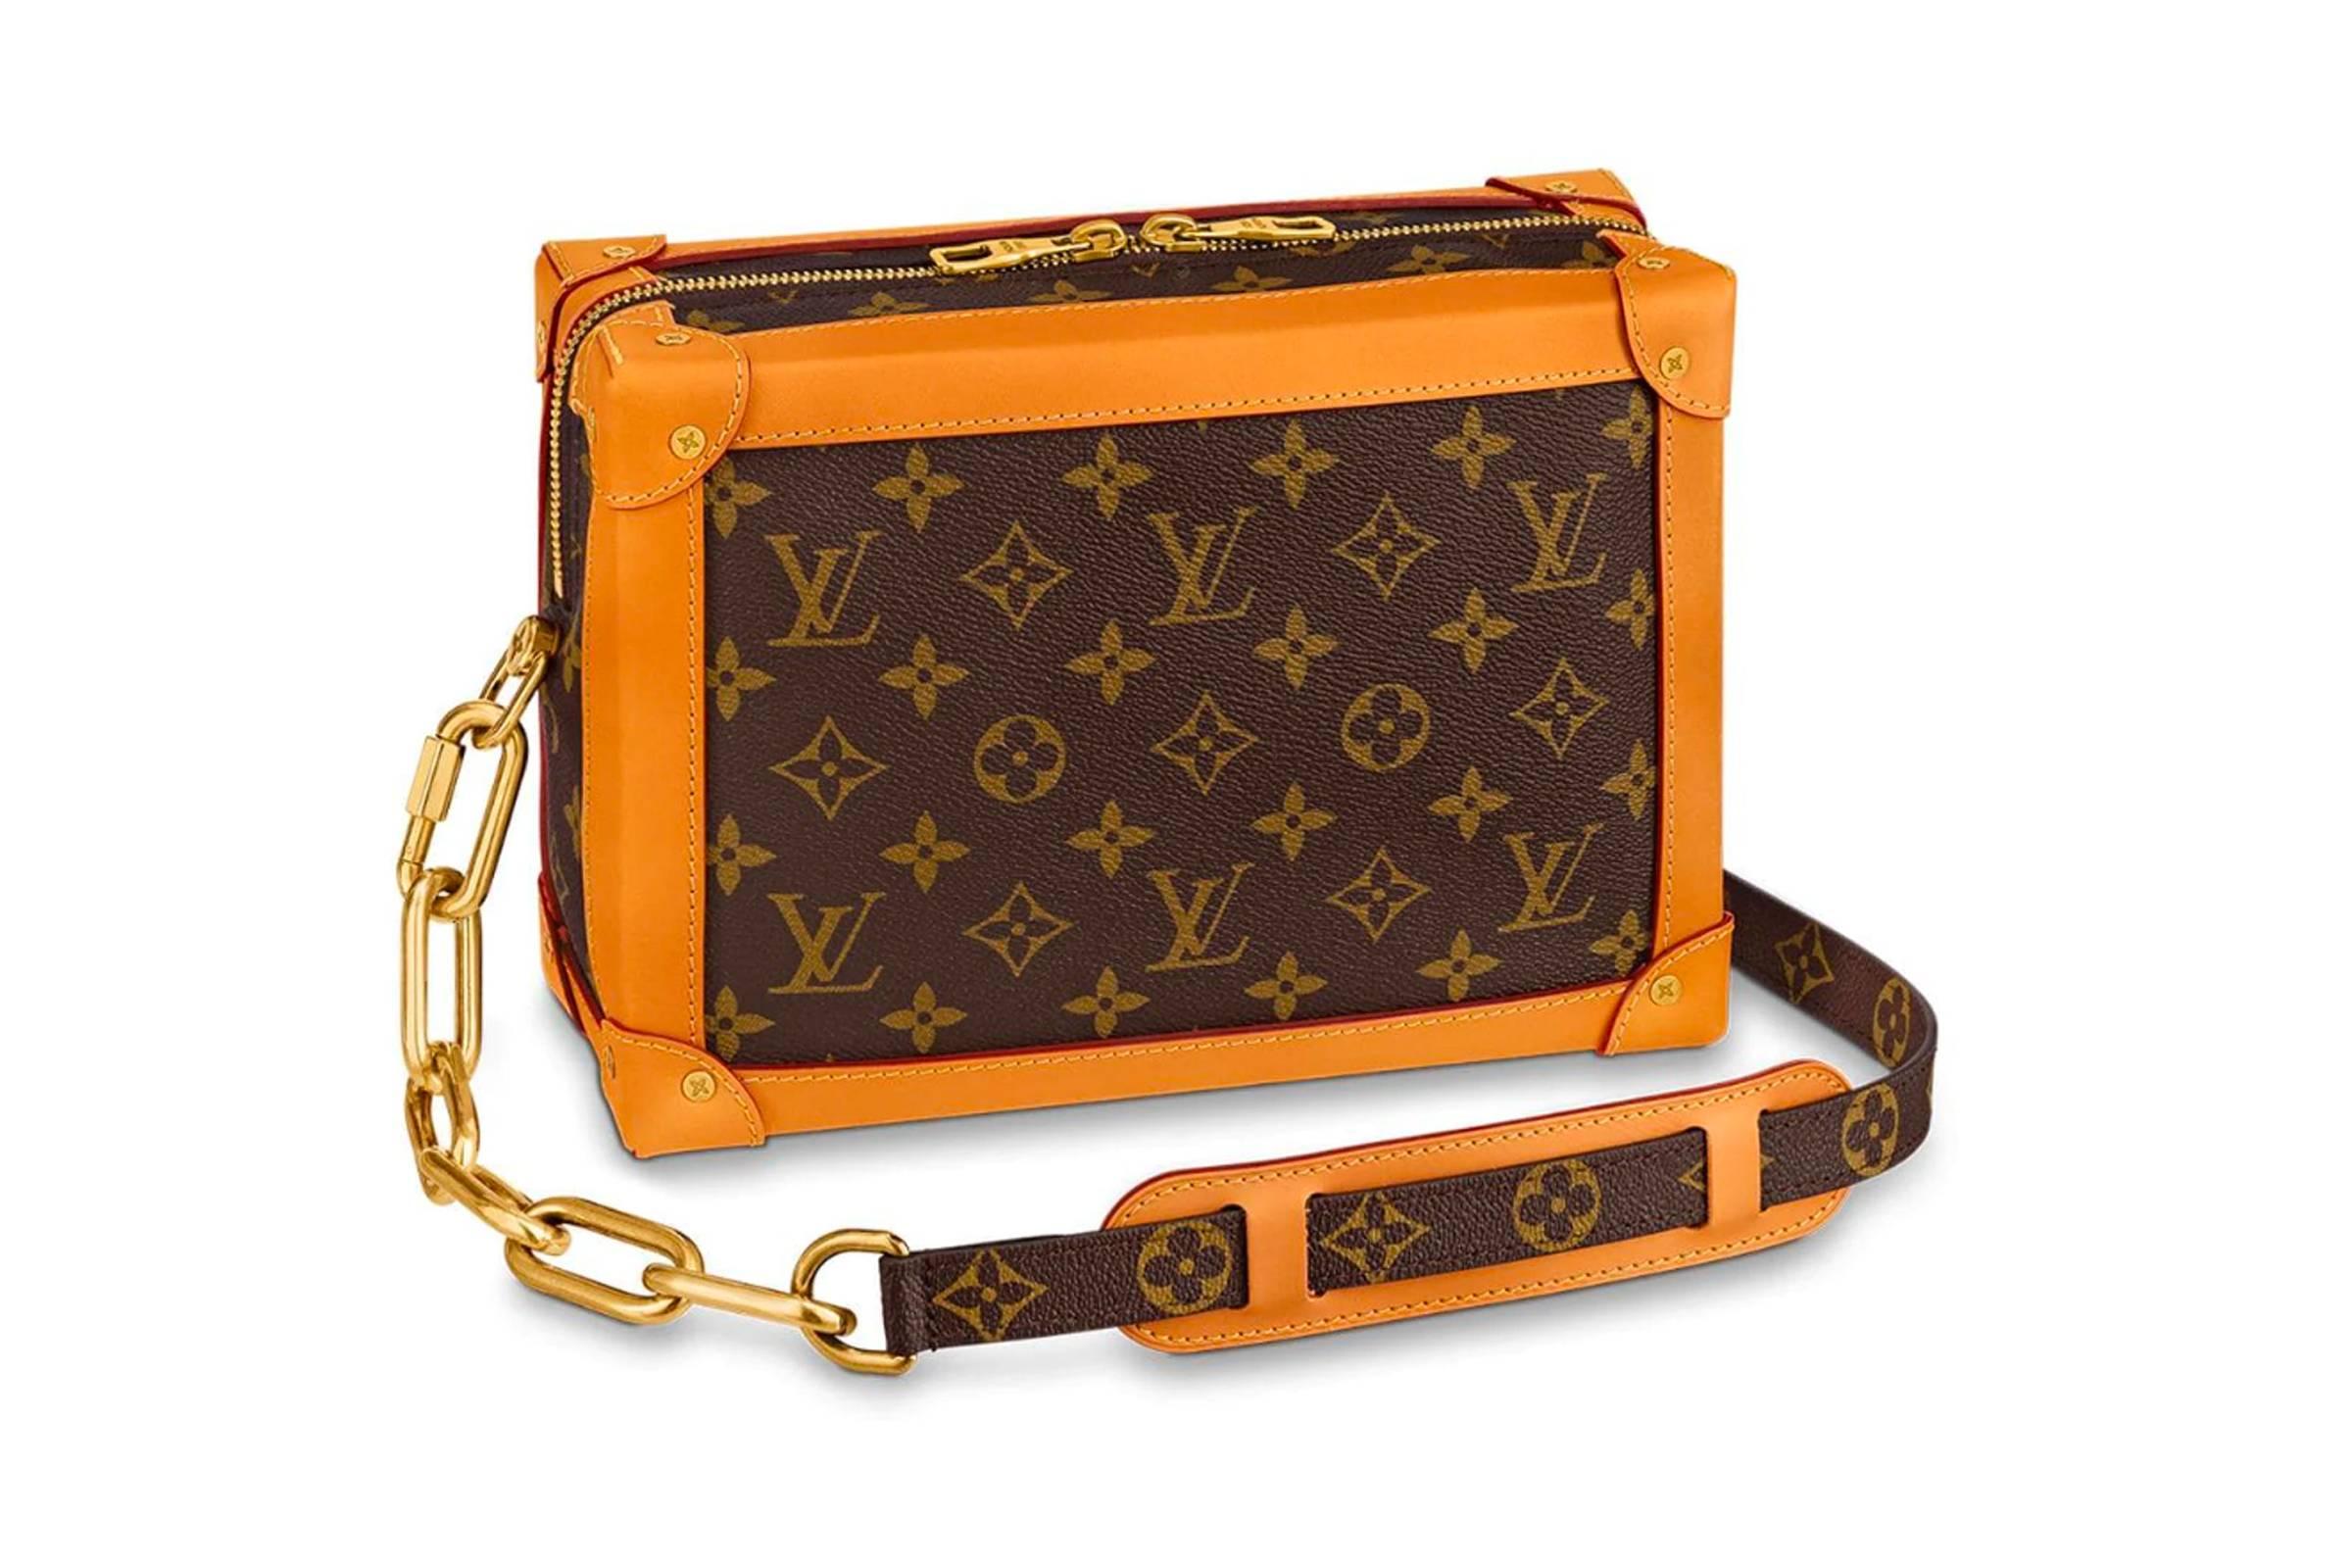 Louis Vuitton Soft Trunk Monogram Gold Tone Brown